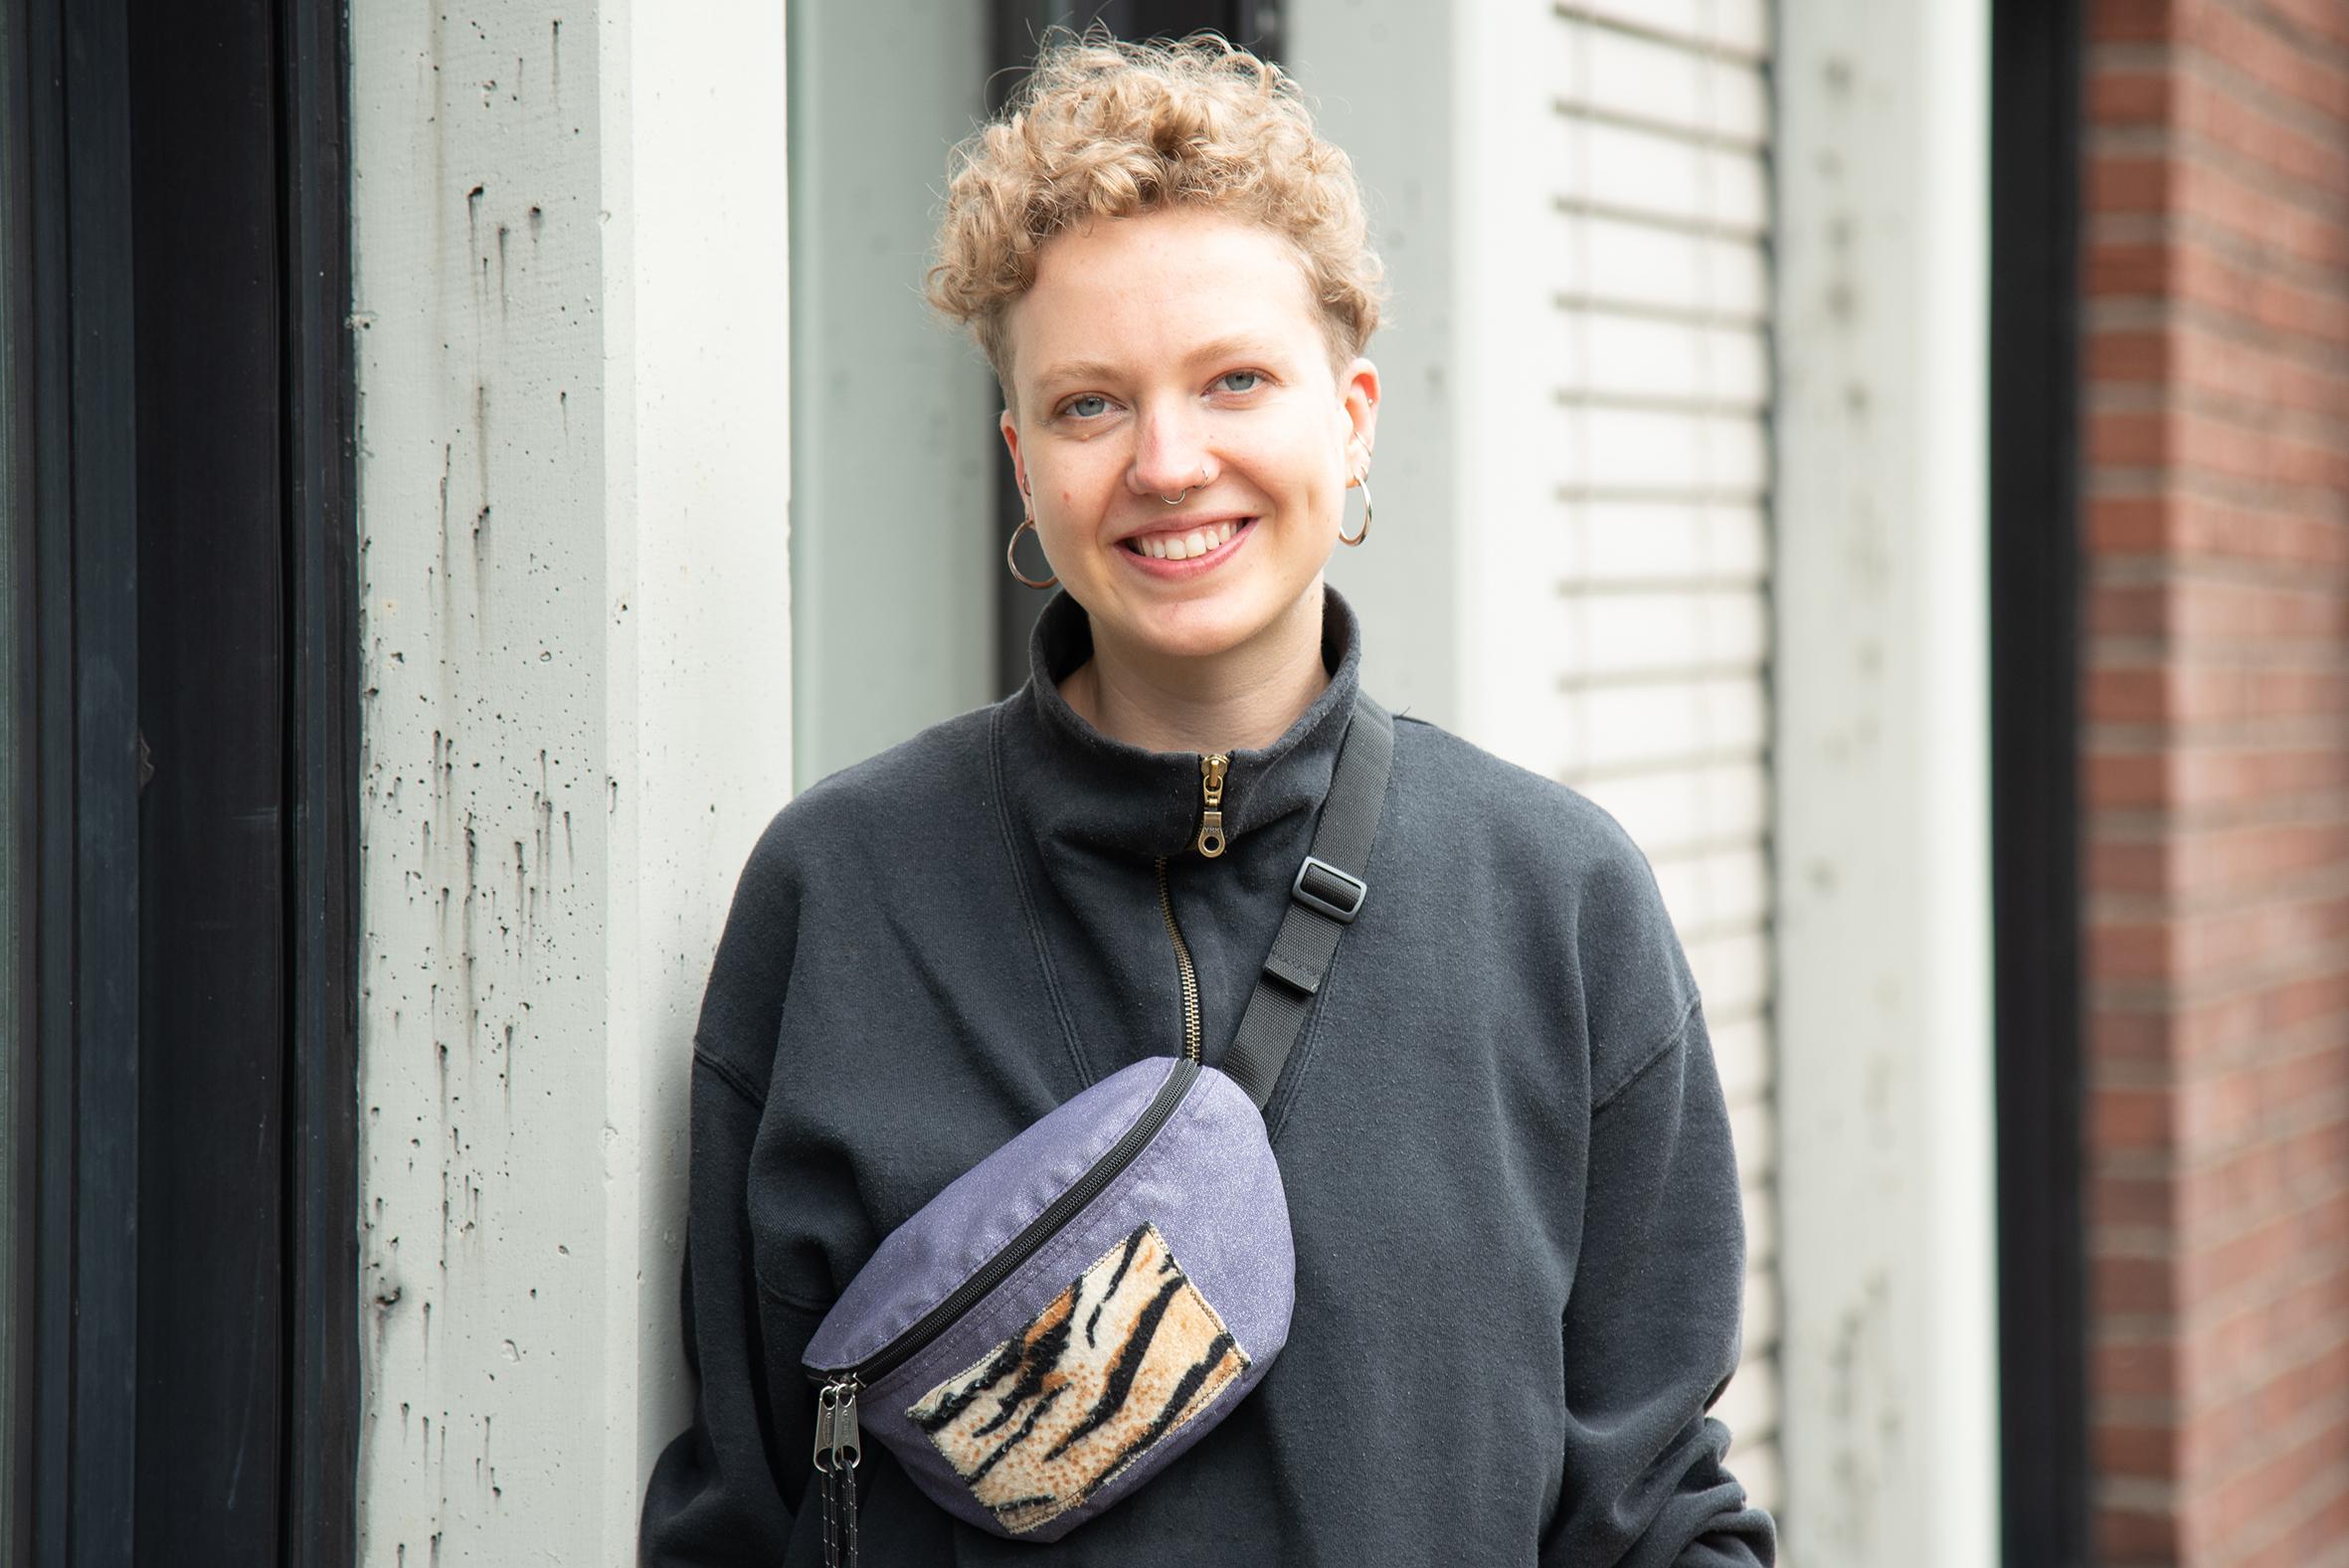 Theresa Scheelje